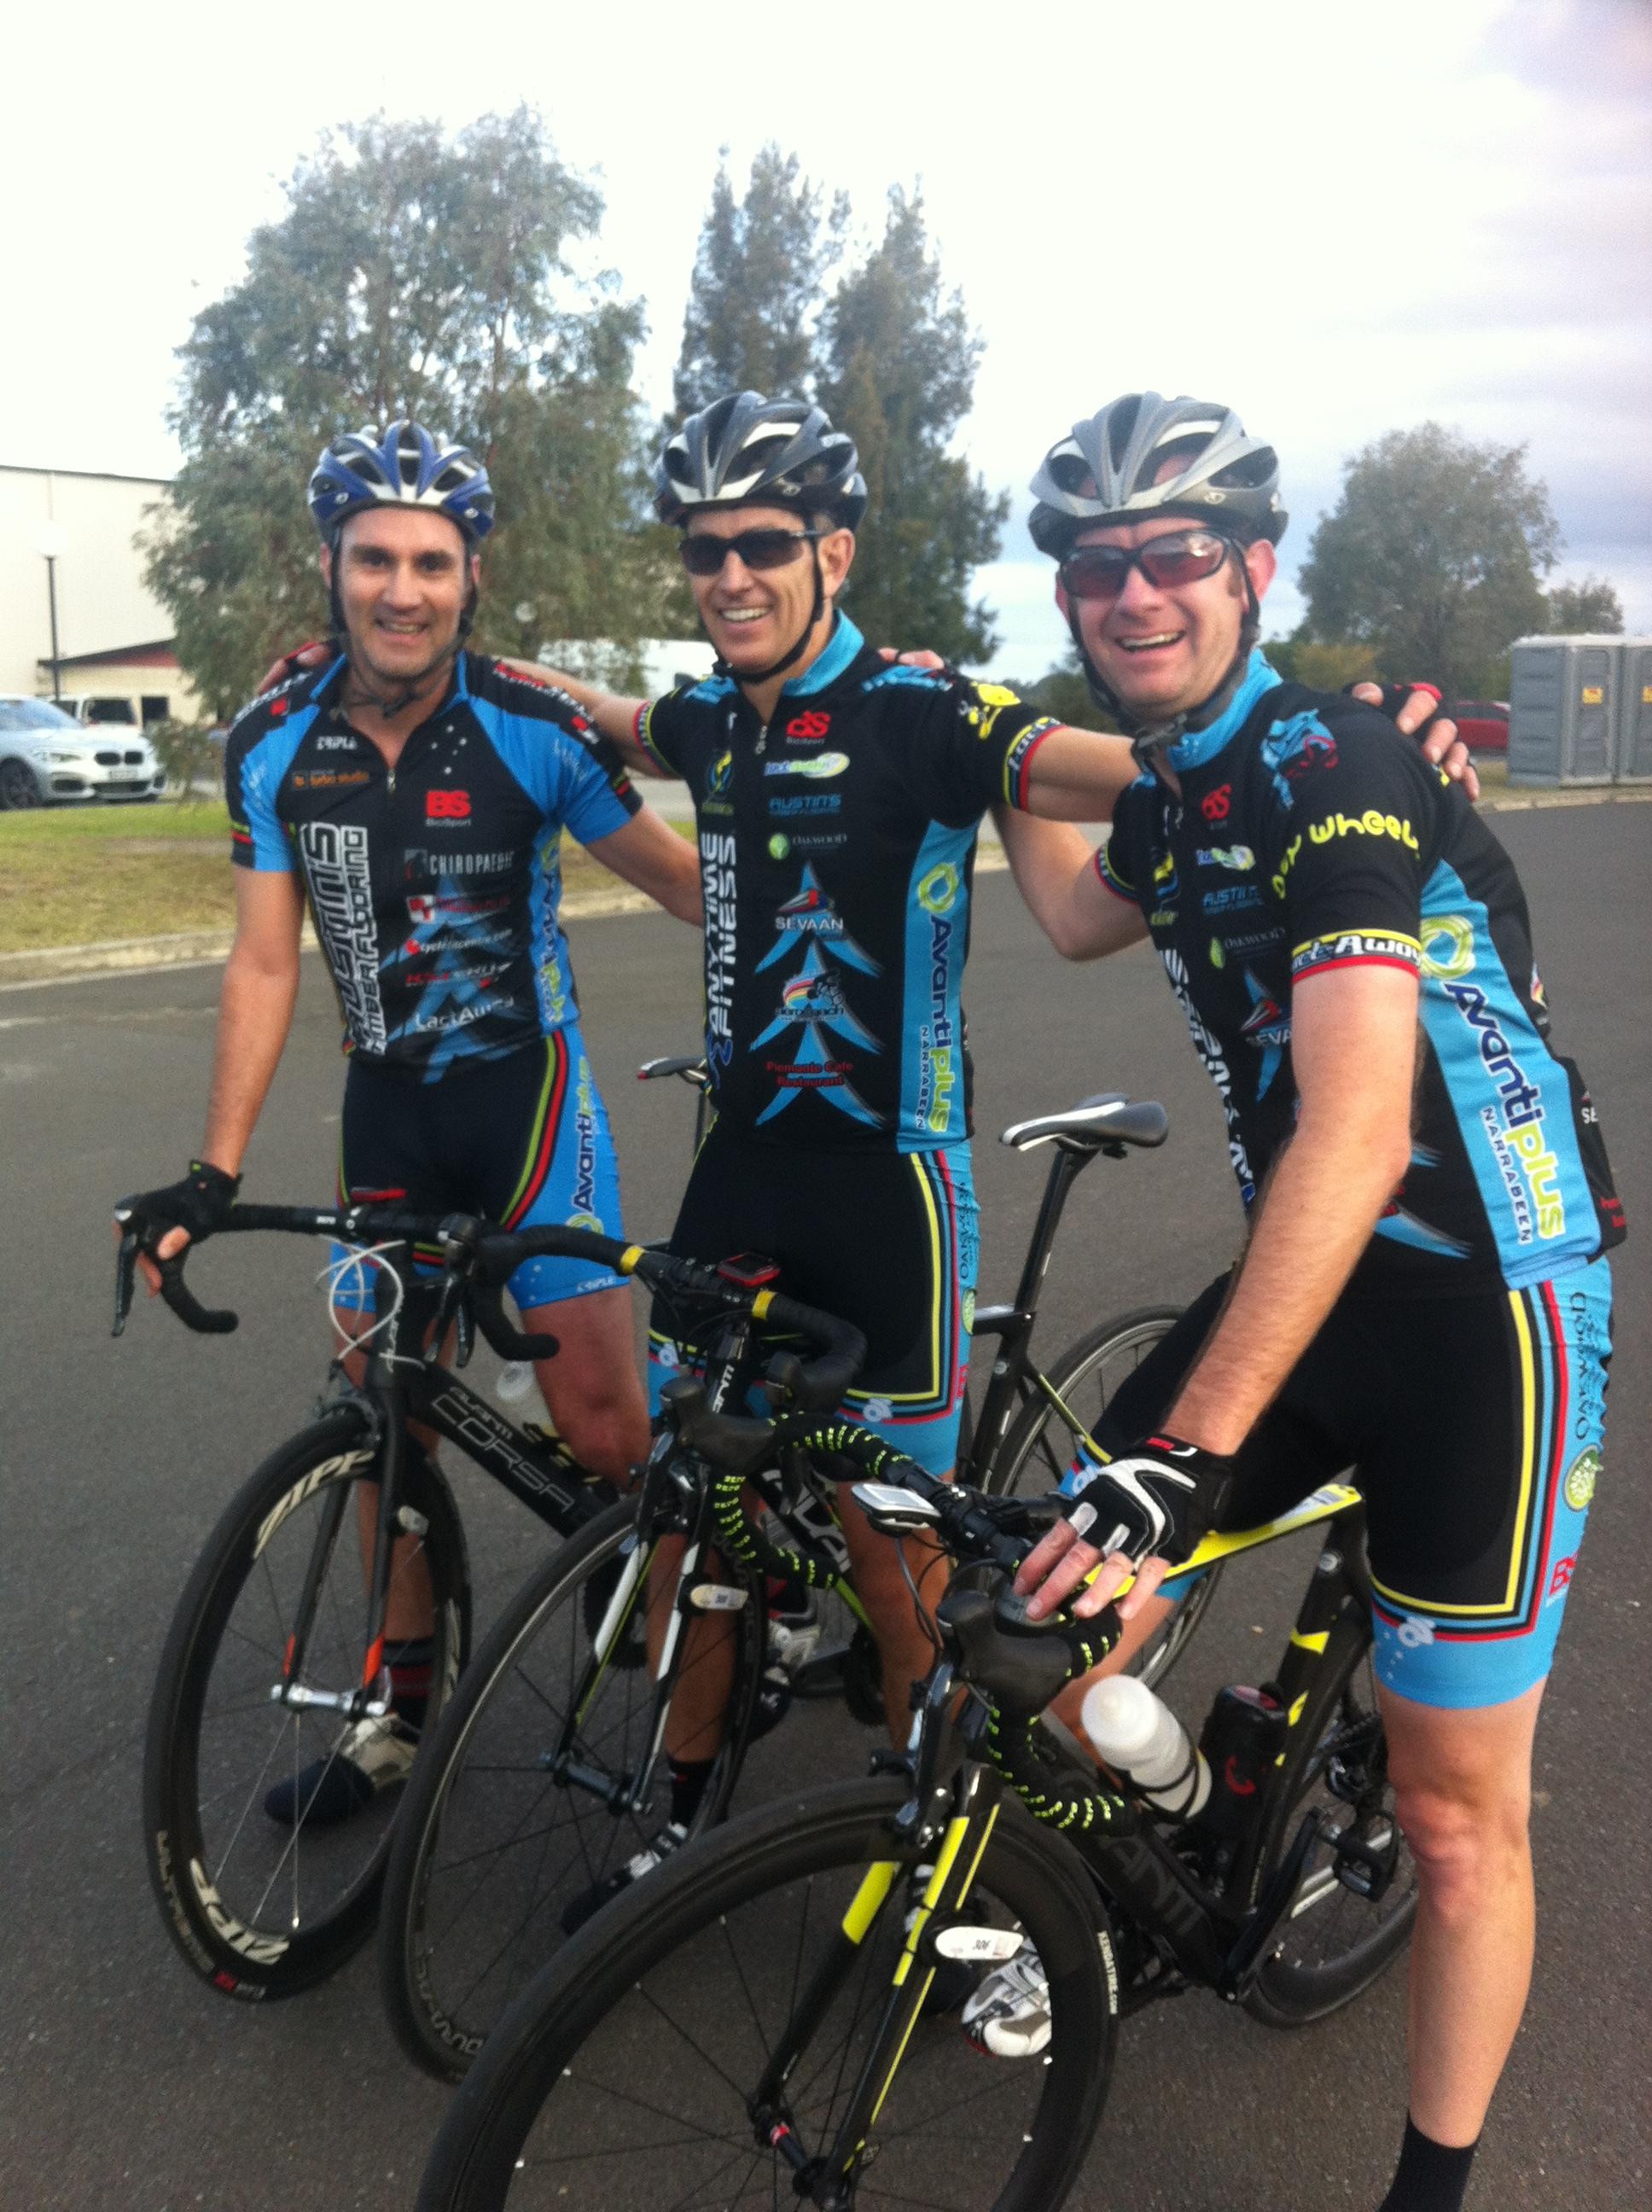 Colin Edmonds, Mark Walsh, Paul Curgenven